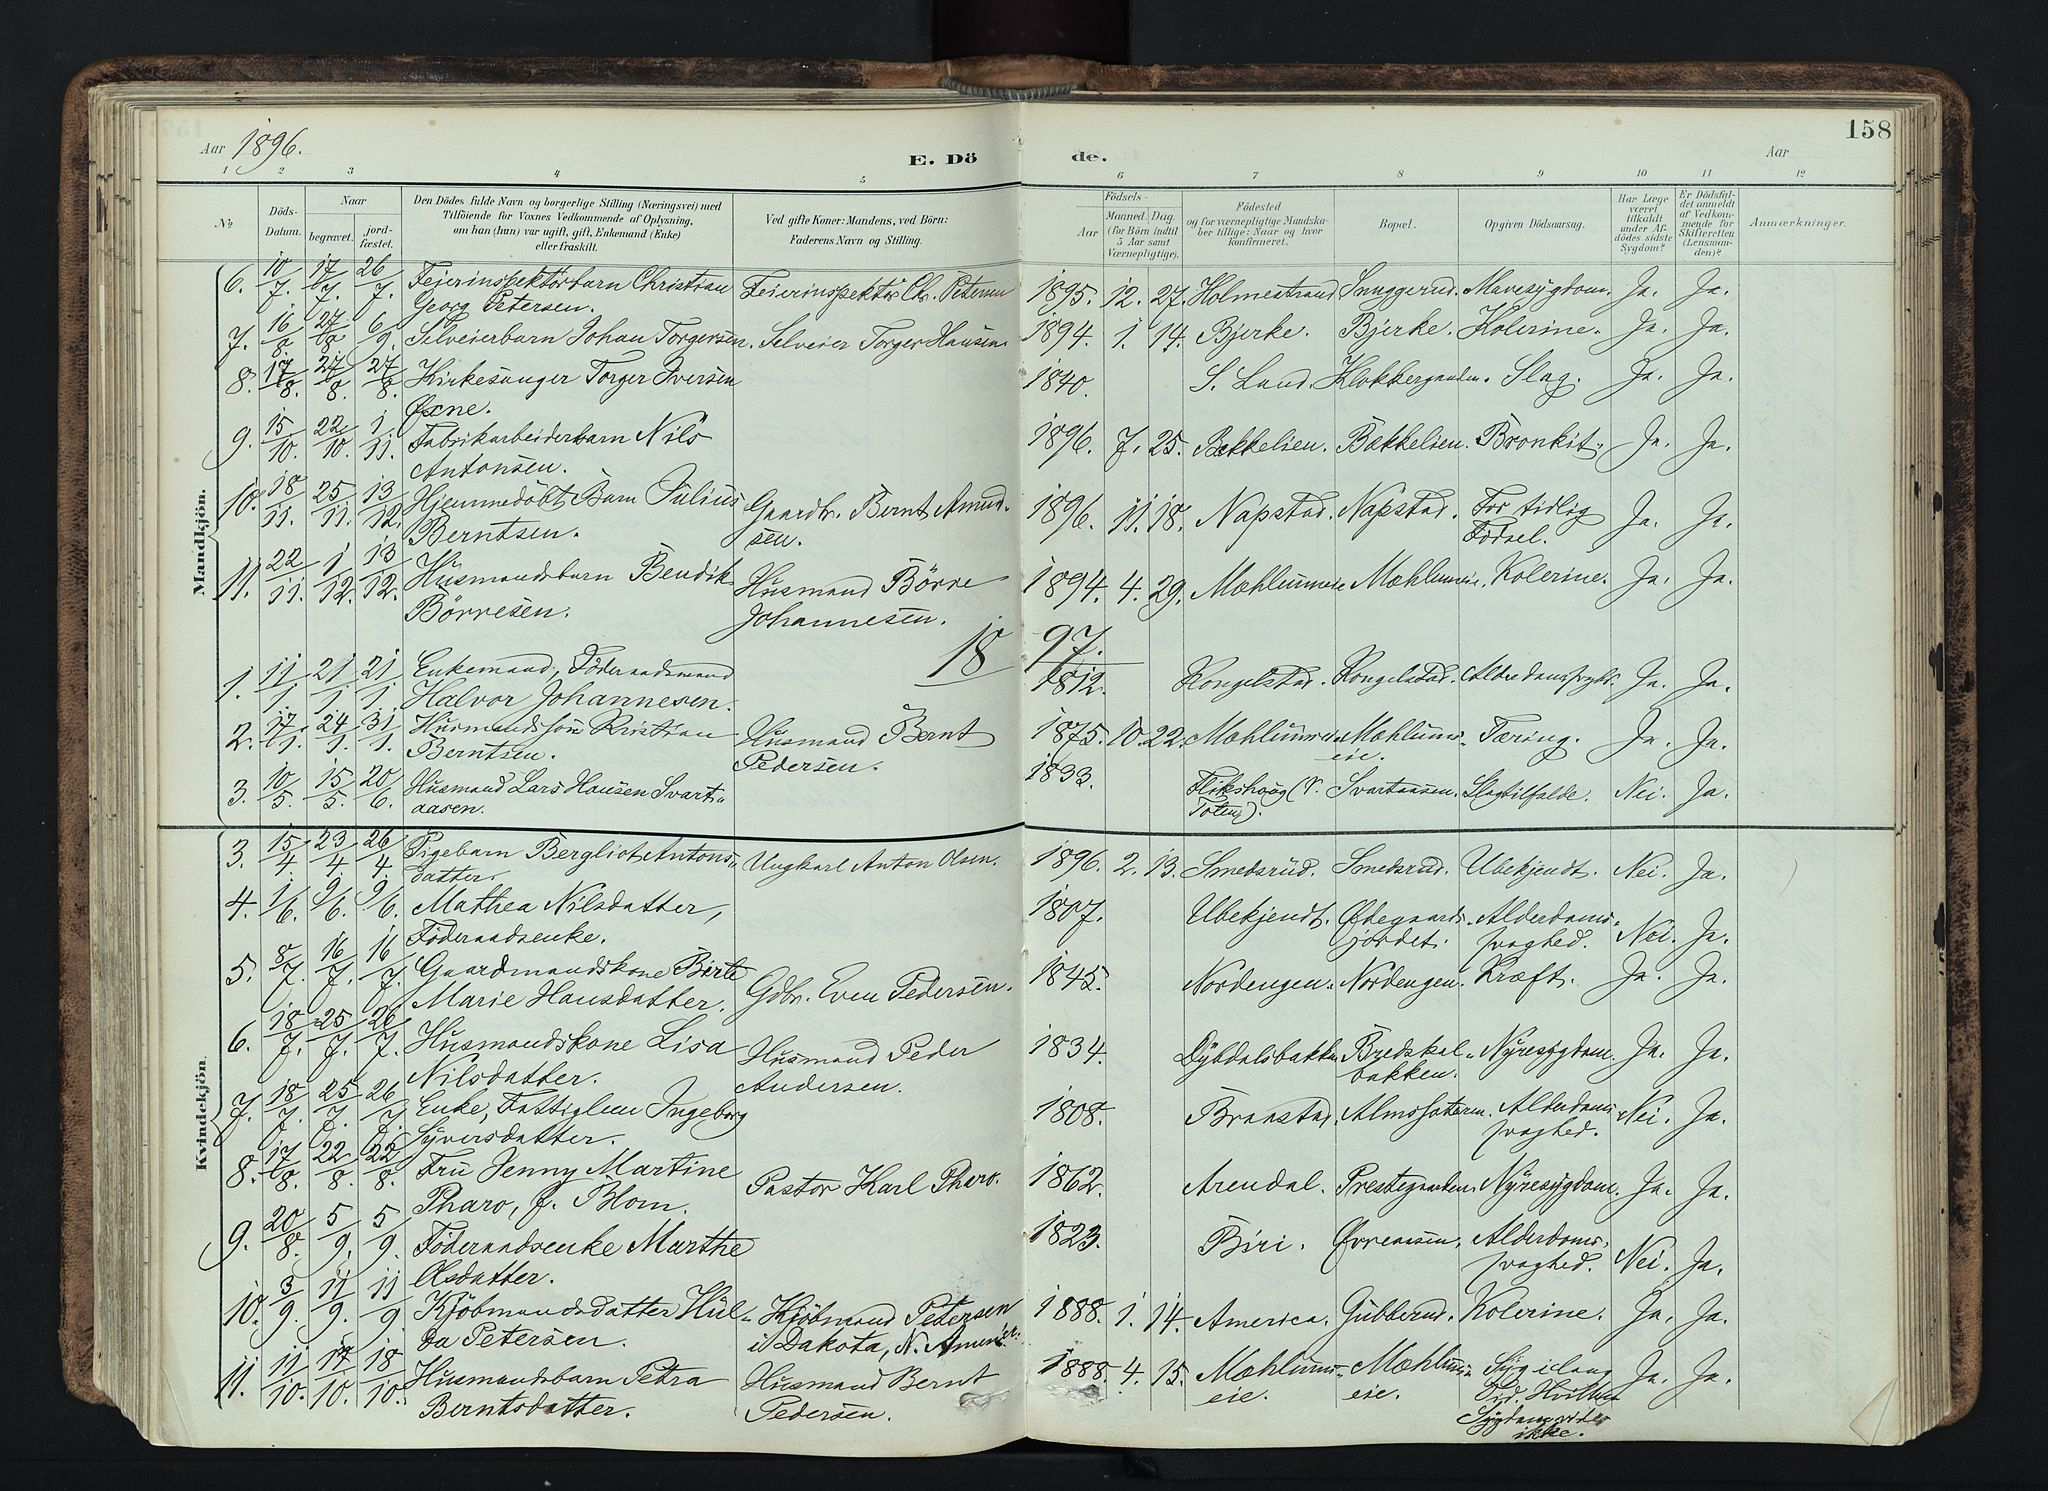 SAH, Vardal prestekontor, H/Ha/Haa/L0019: Ministerialbok nr. 19, 1893-1907, s. 158